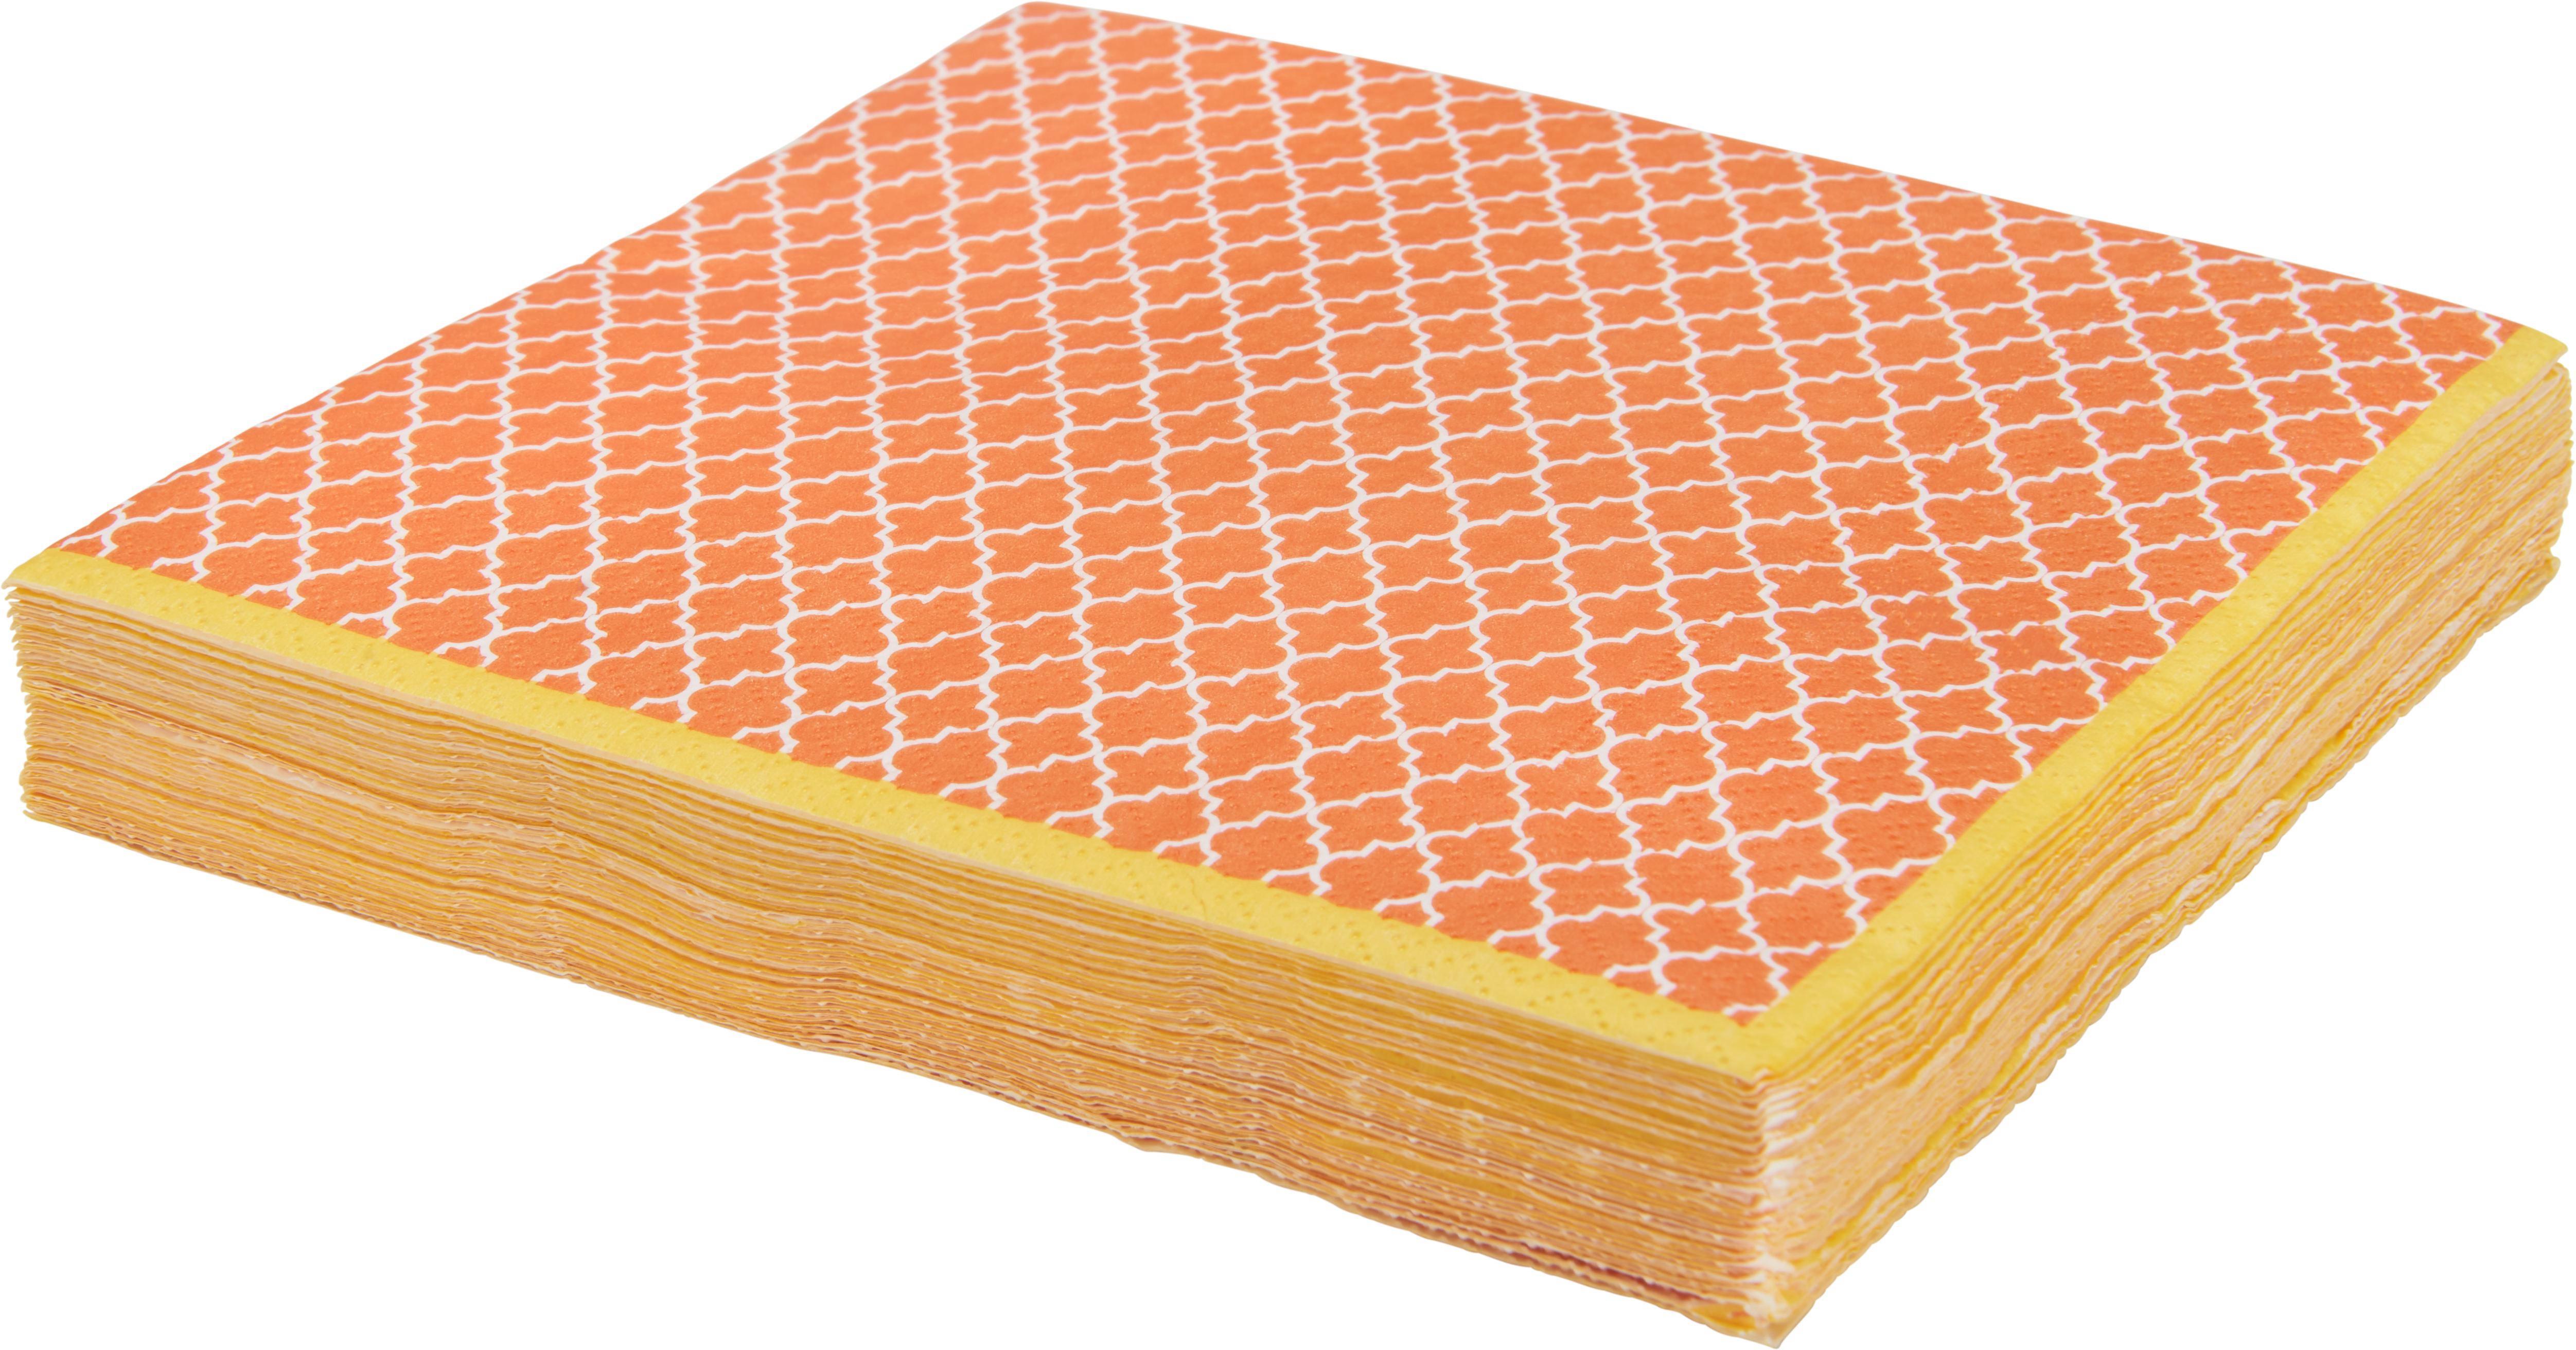 Serviette Sahara 3-lagig in Orange - Orange, LIFESTYLE, Papier (16,5/16,5/2,5cm) - MÖMAX modern living